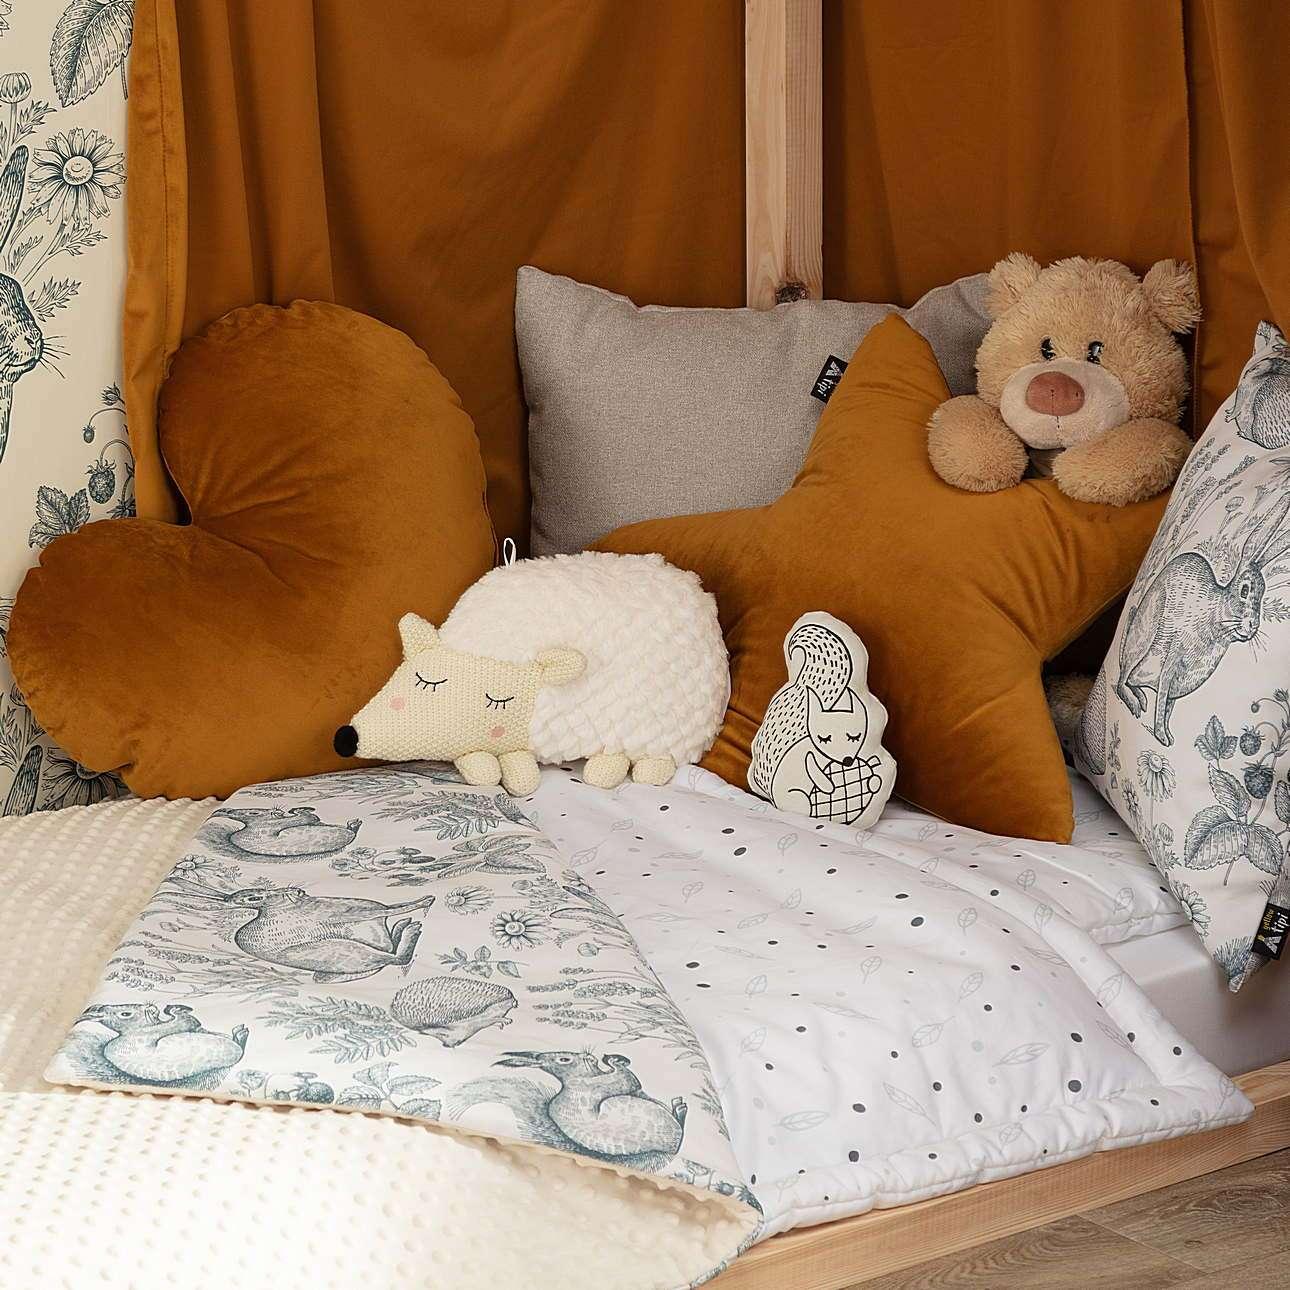 Hedgehog cuddle pillow